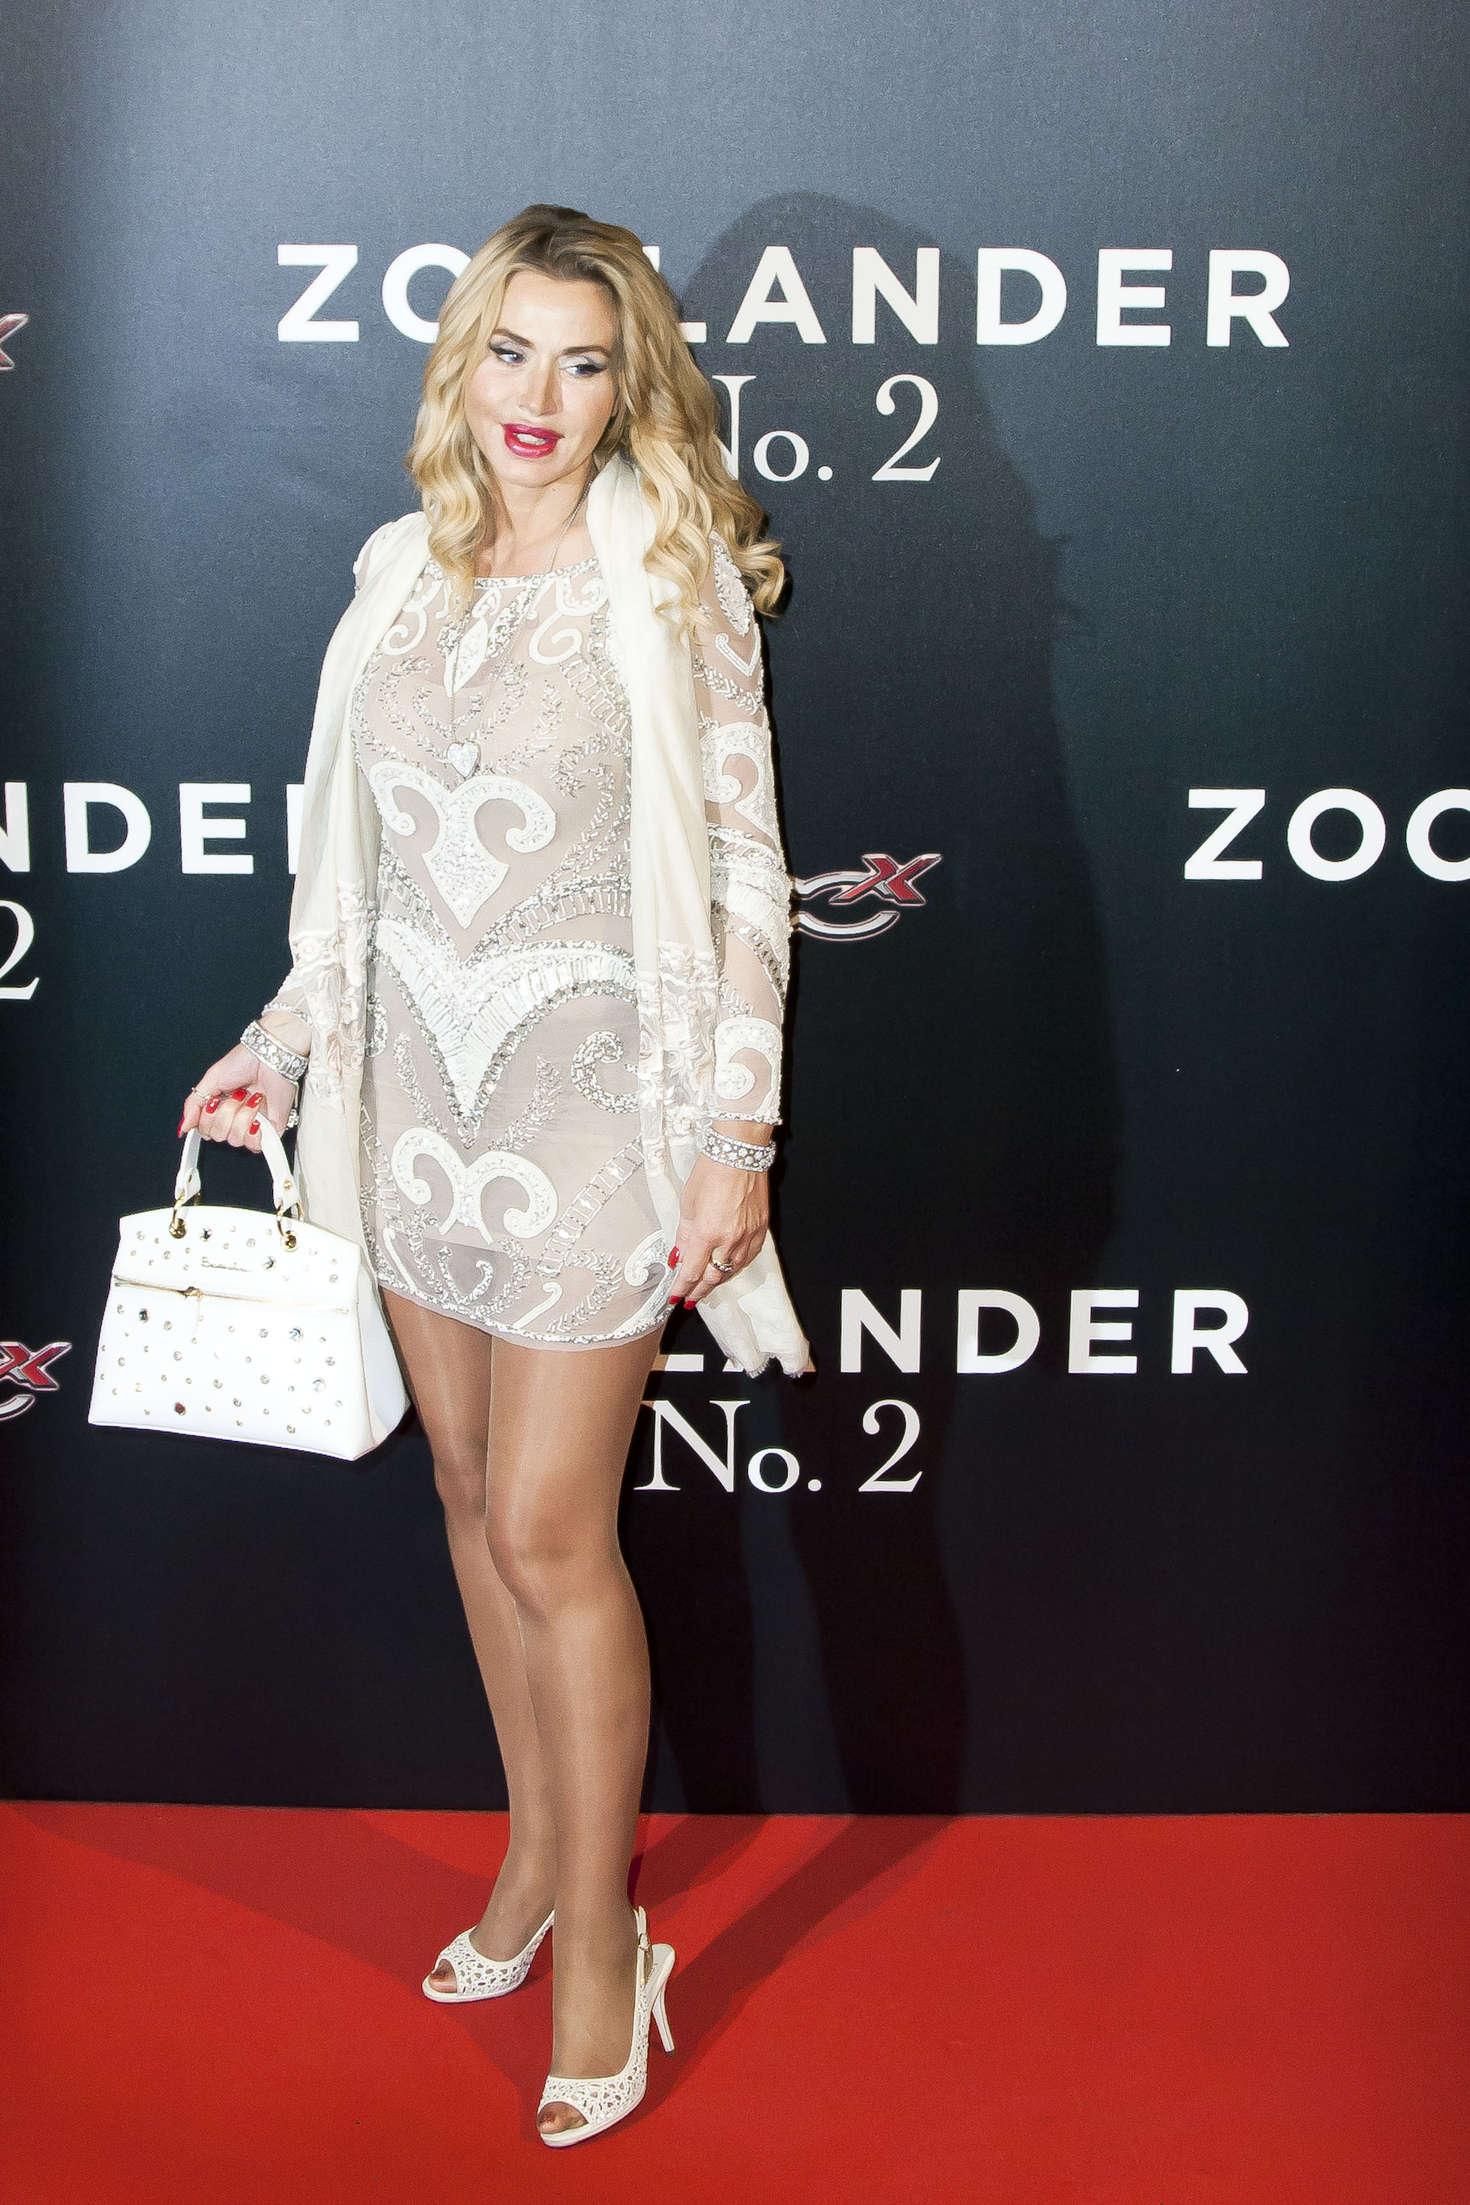 Valeria Marini - 'Zoolander 2' Premiere in Rome